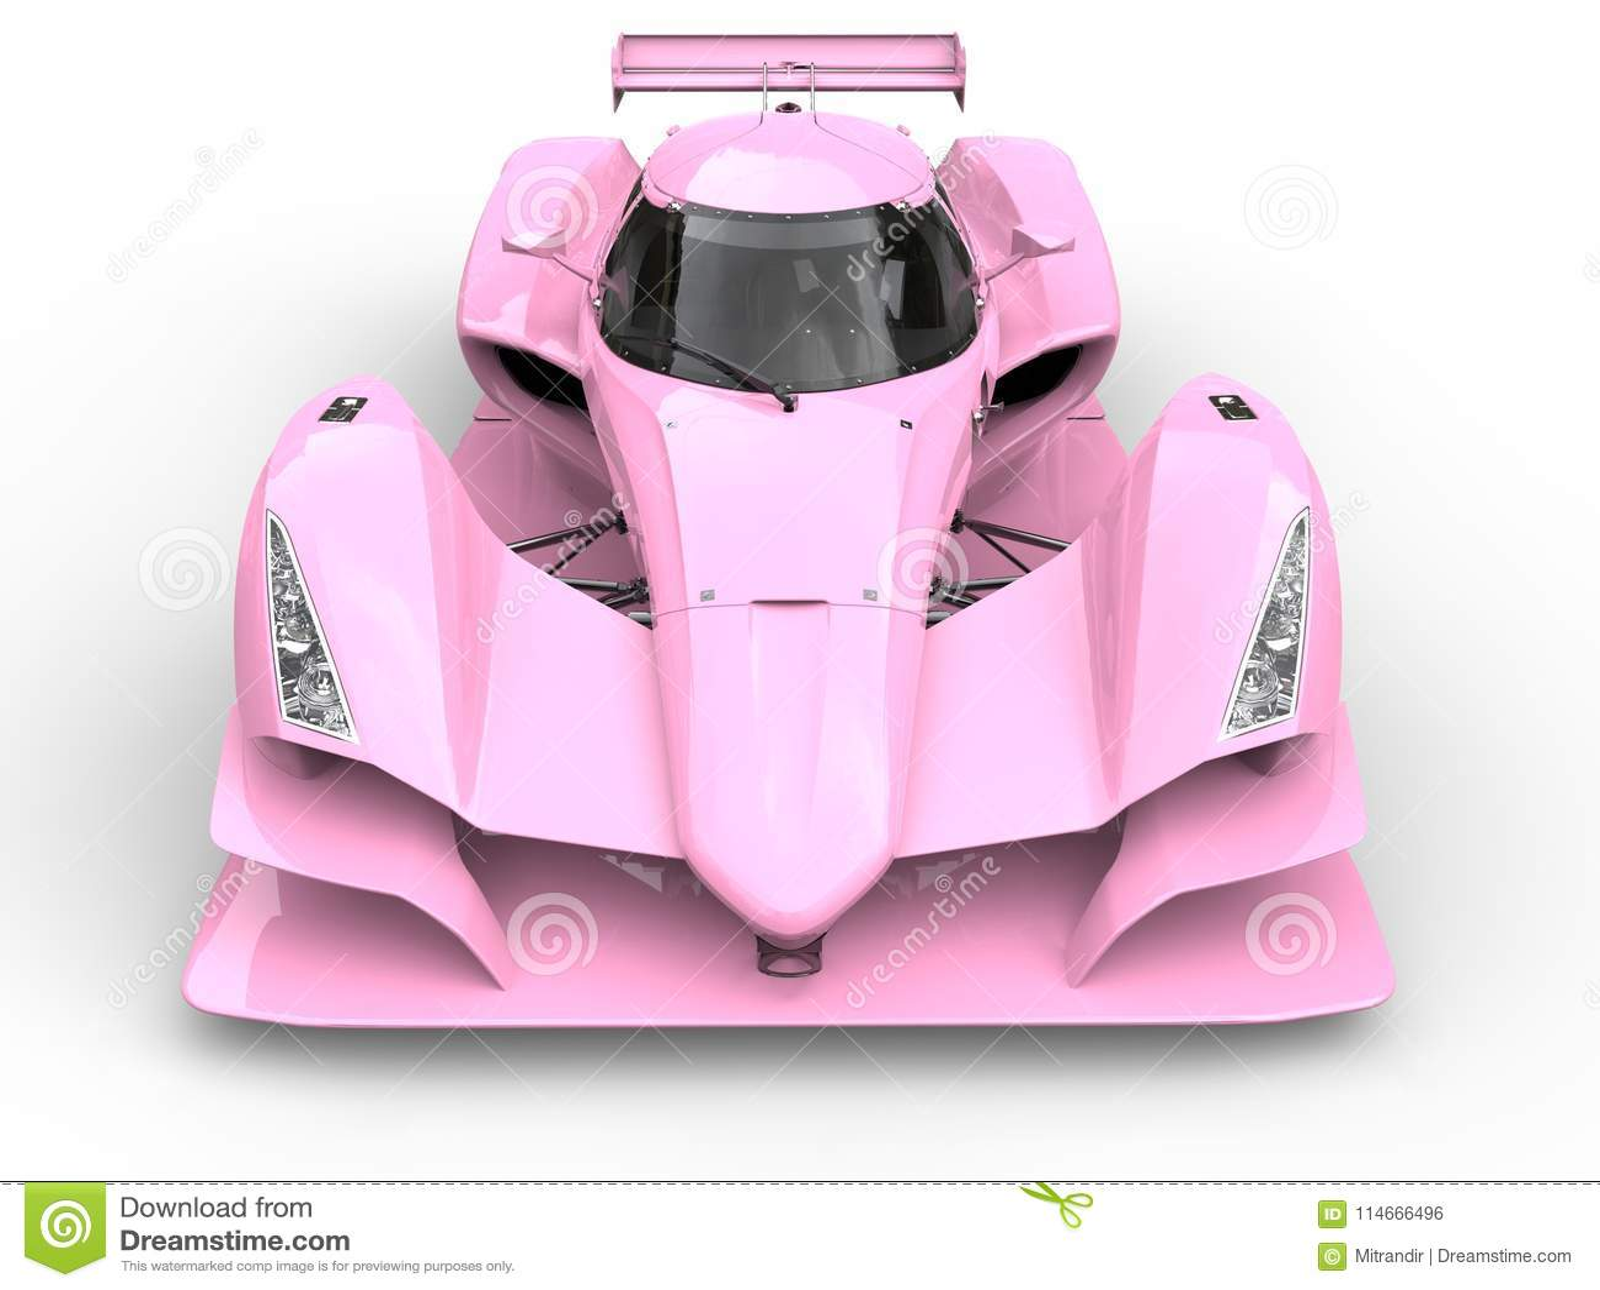 Gentle pink super sports race car - front view closeup shot